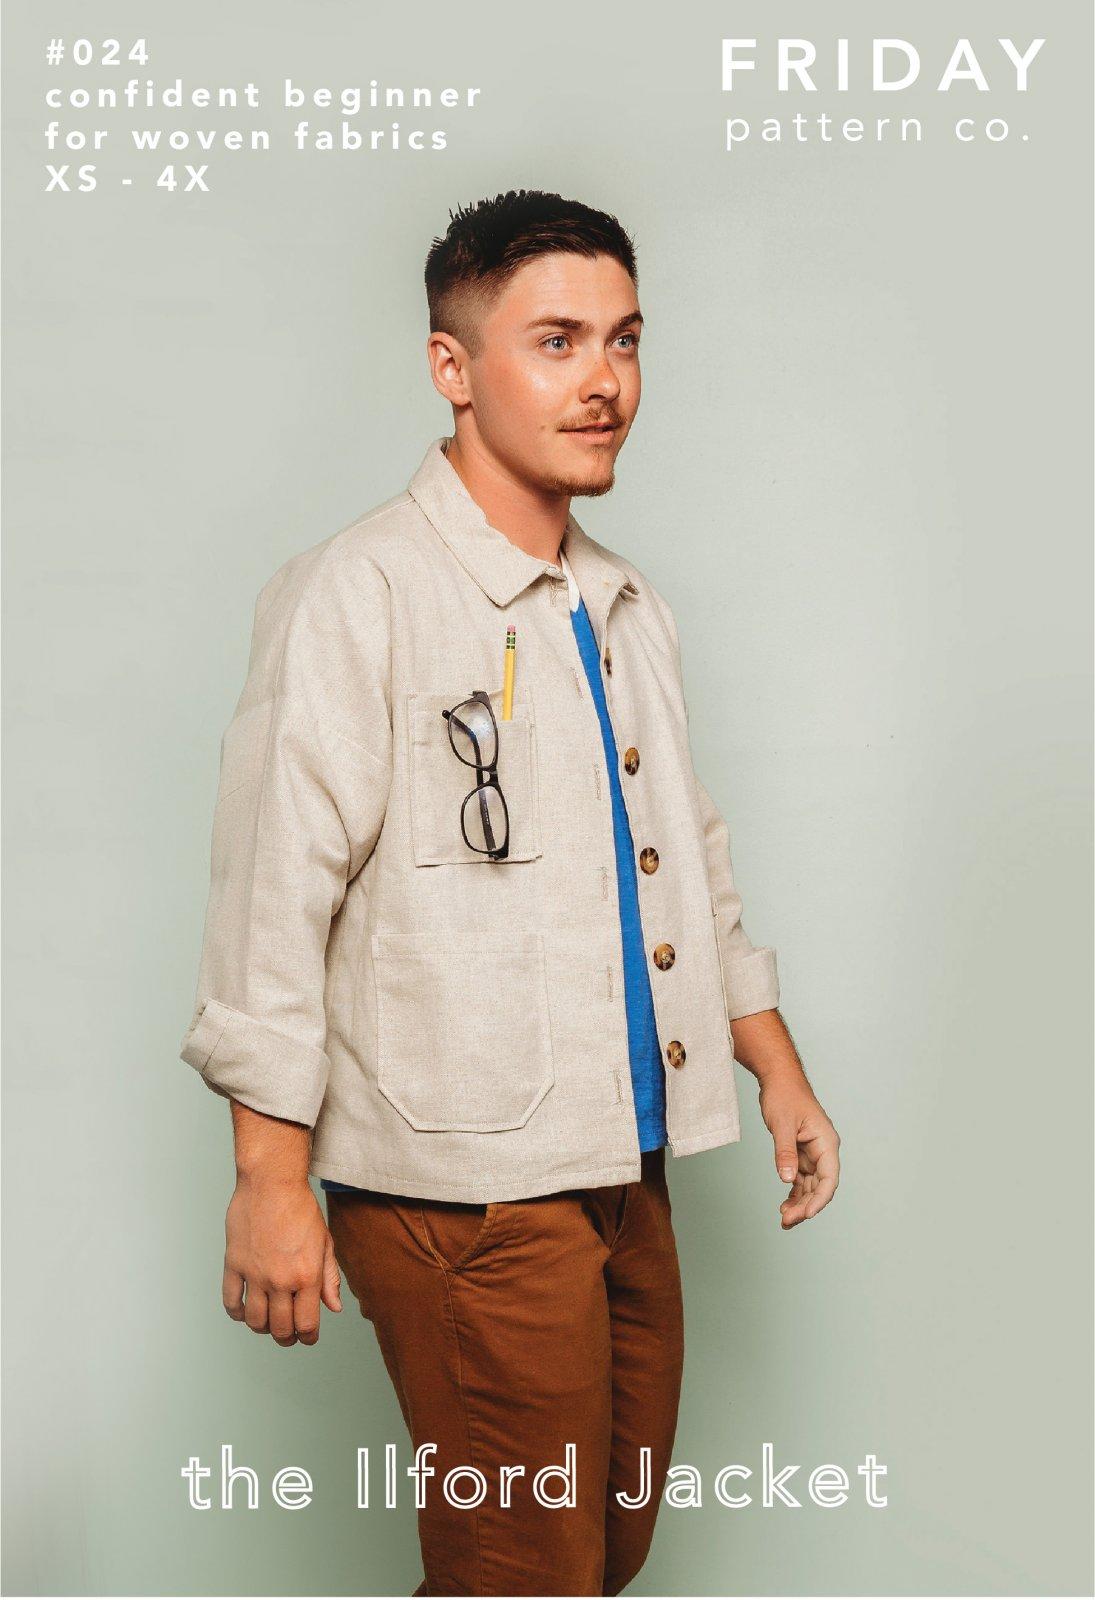 Ilford Jacket - Friday Pattern Co